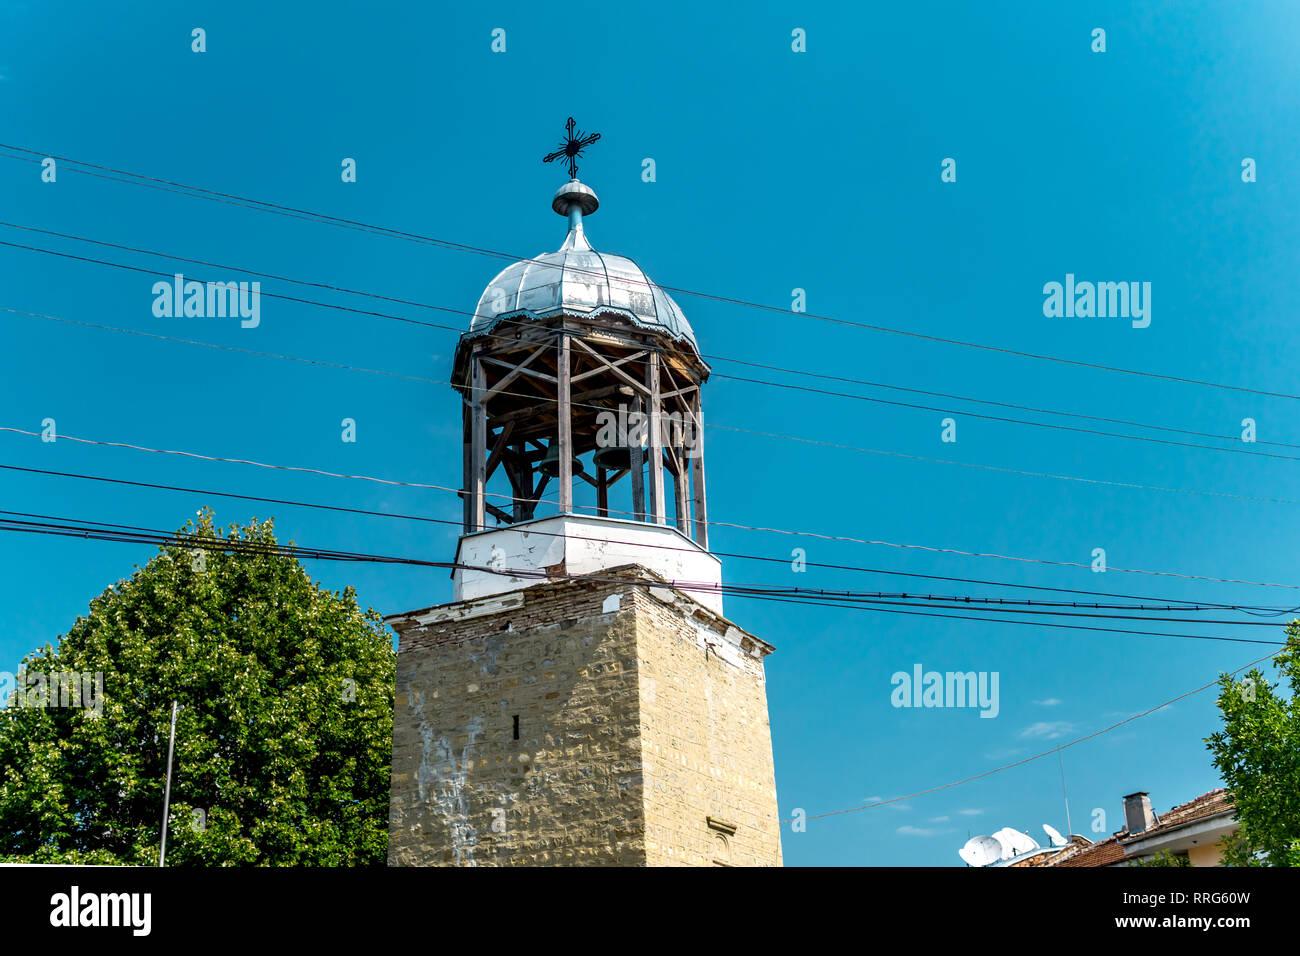 Sky Synonym Stock Photos & Sky Synonym Stock Images - Alamy